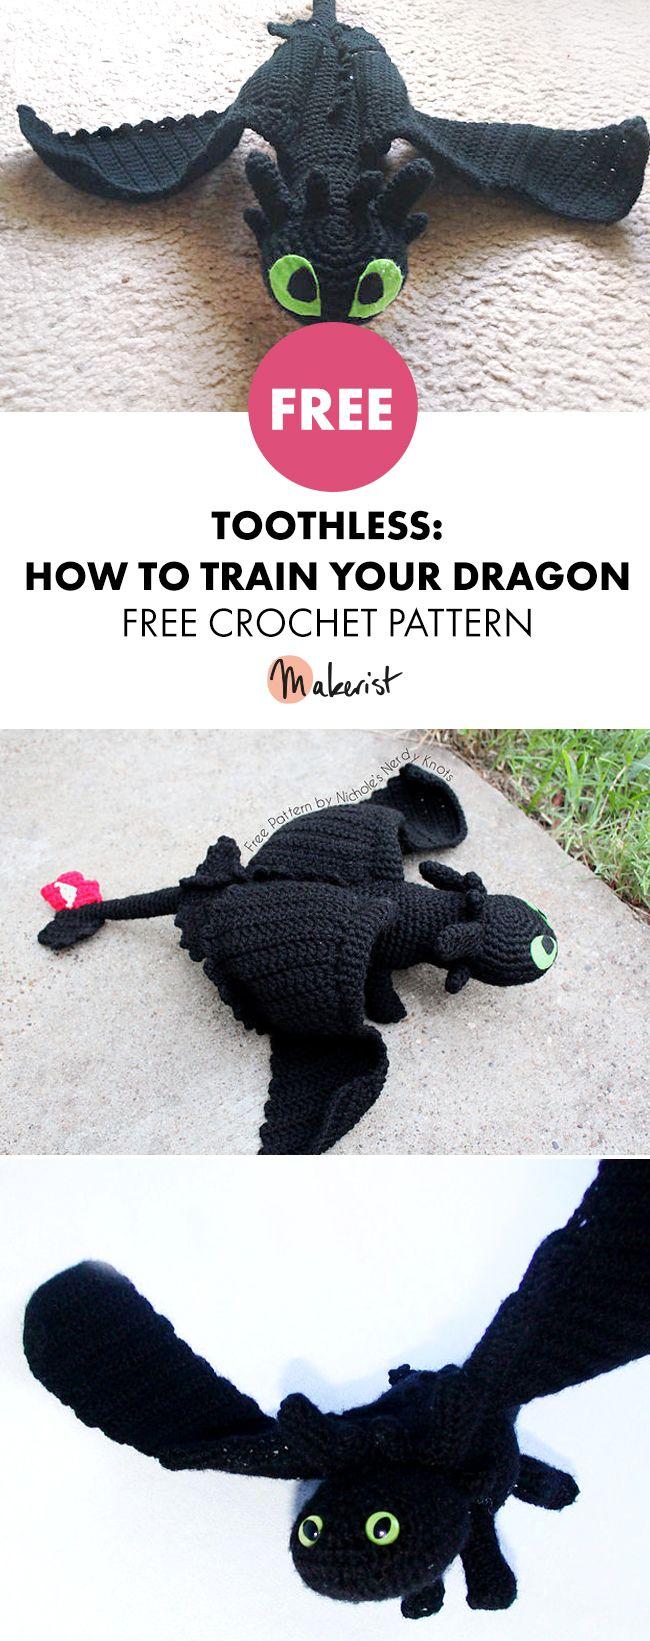 Toothless - Free Crochet Pattern #crocheting #crochet # ...